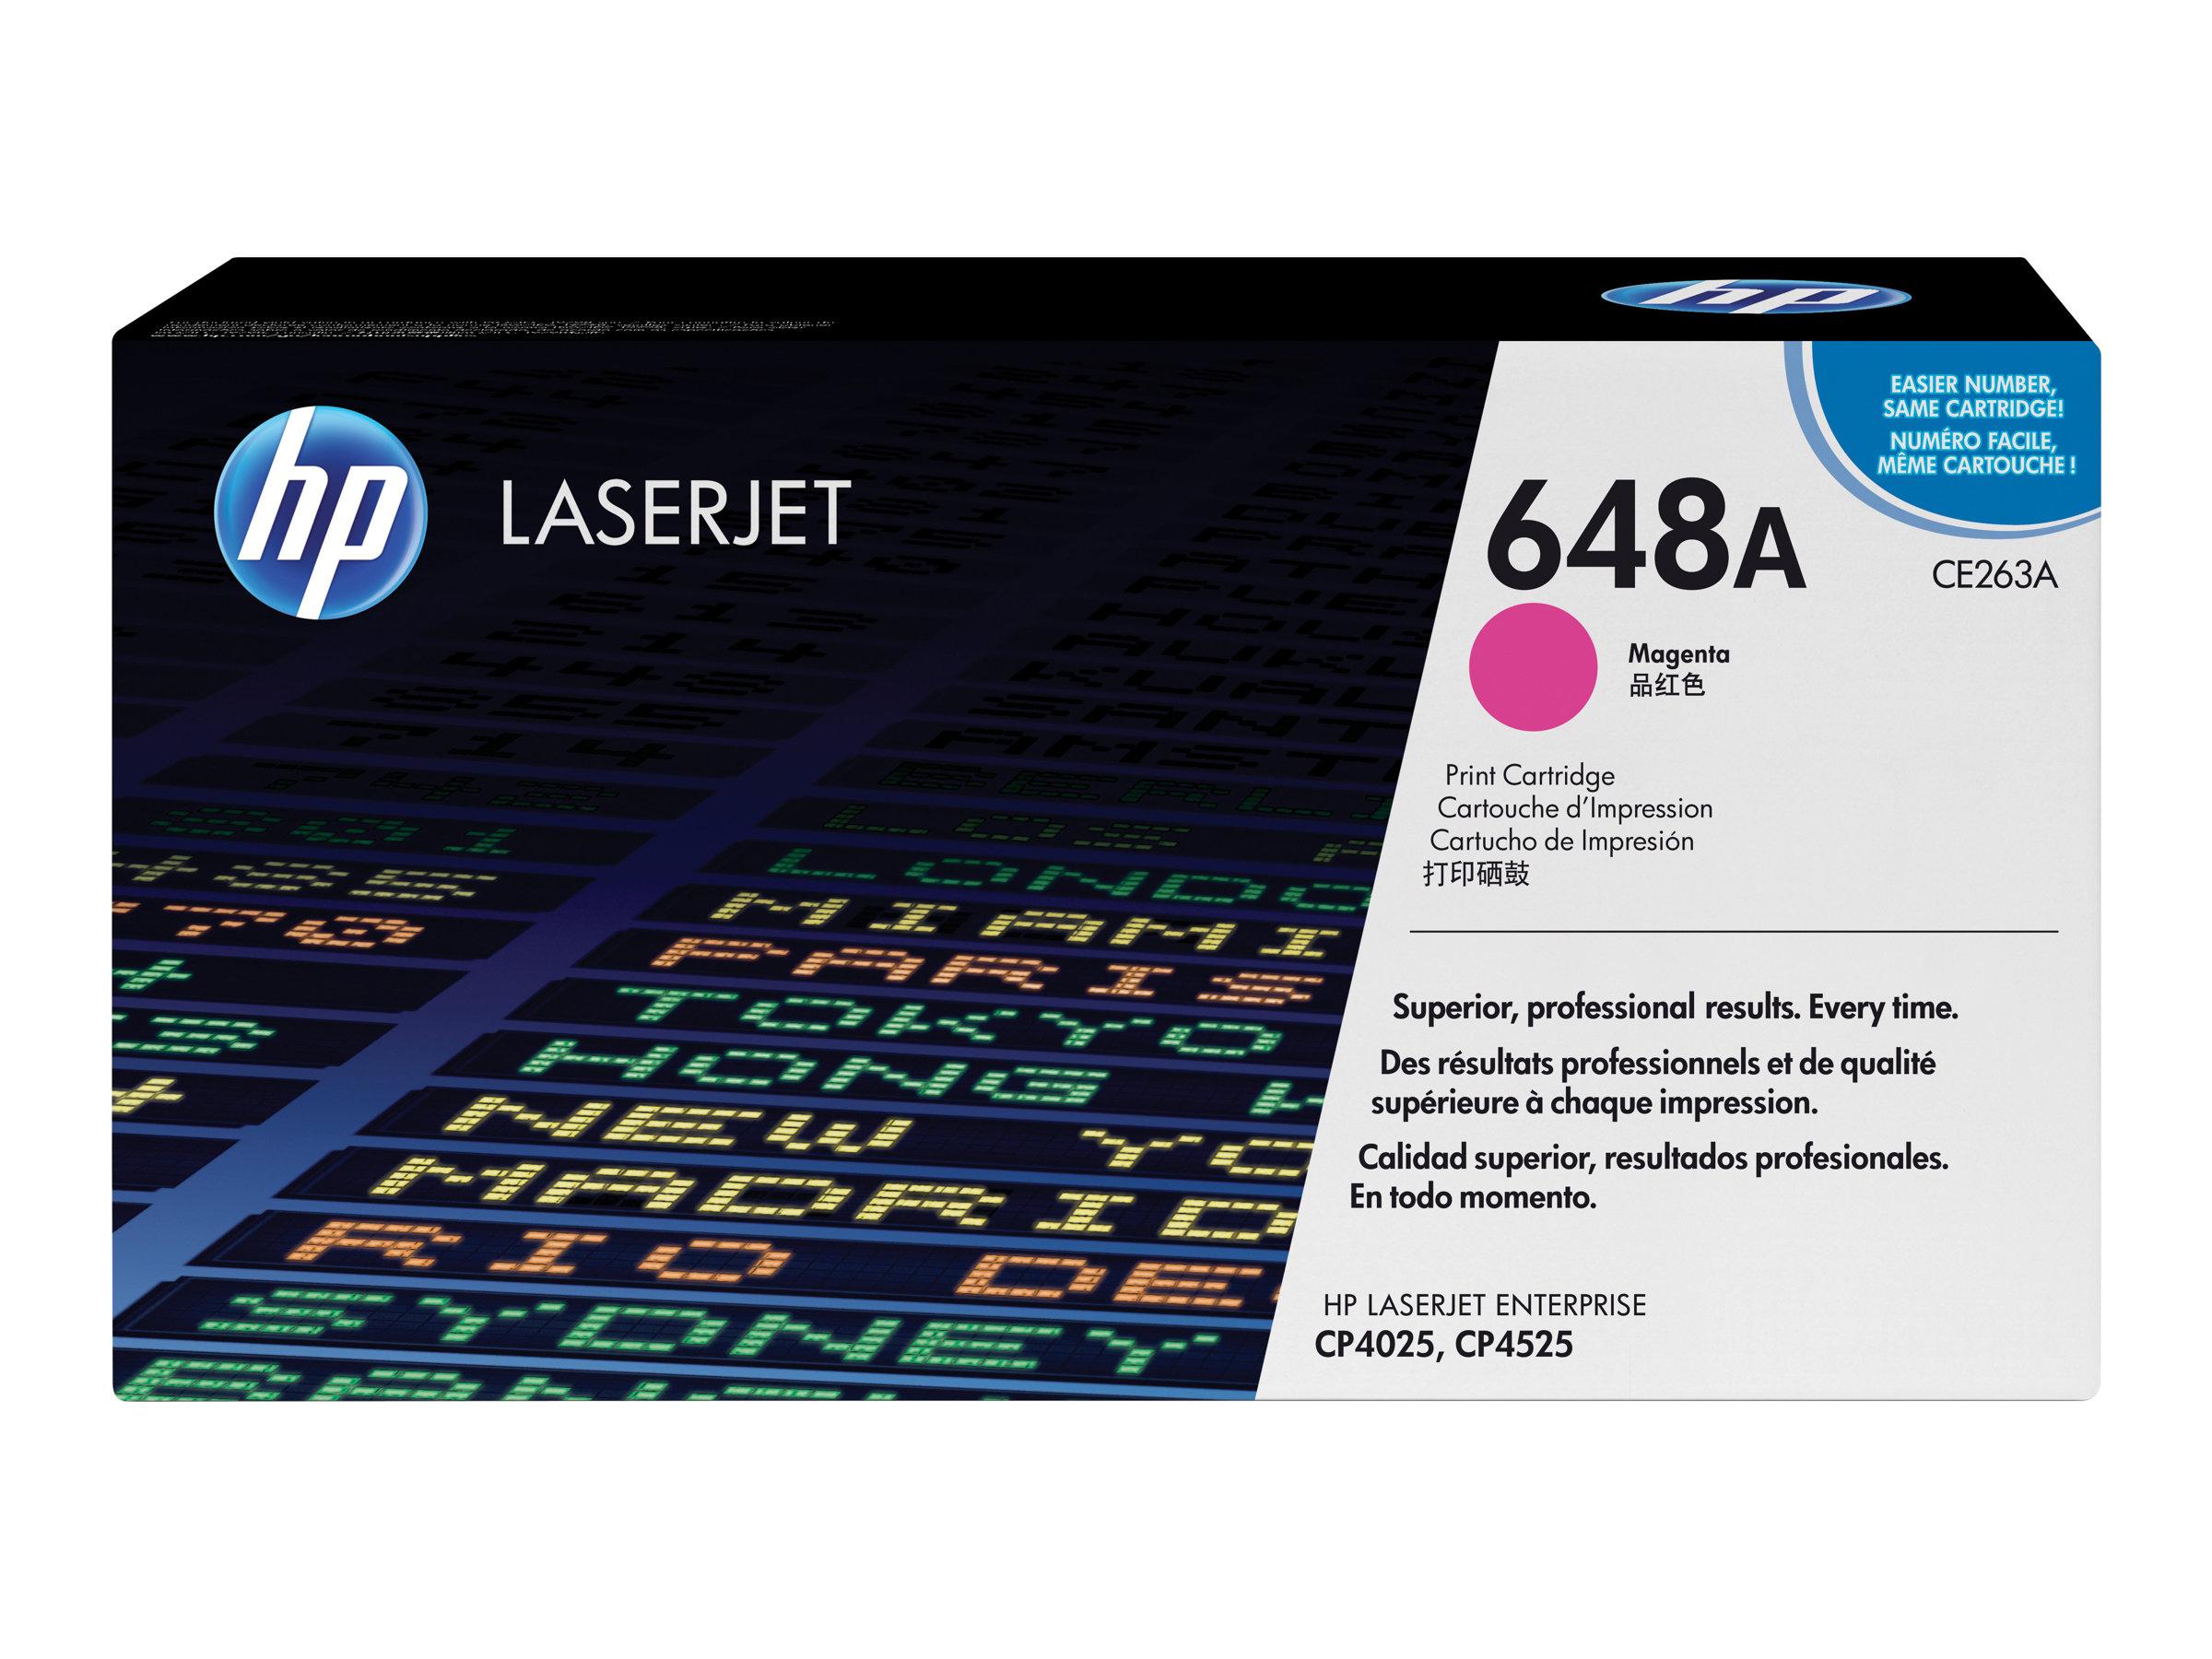 HP 648A - magenta - originale - LaserJet - cartouche de toner (CE263A)